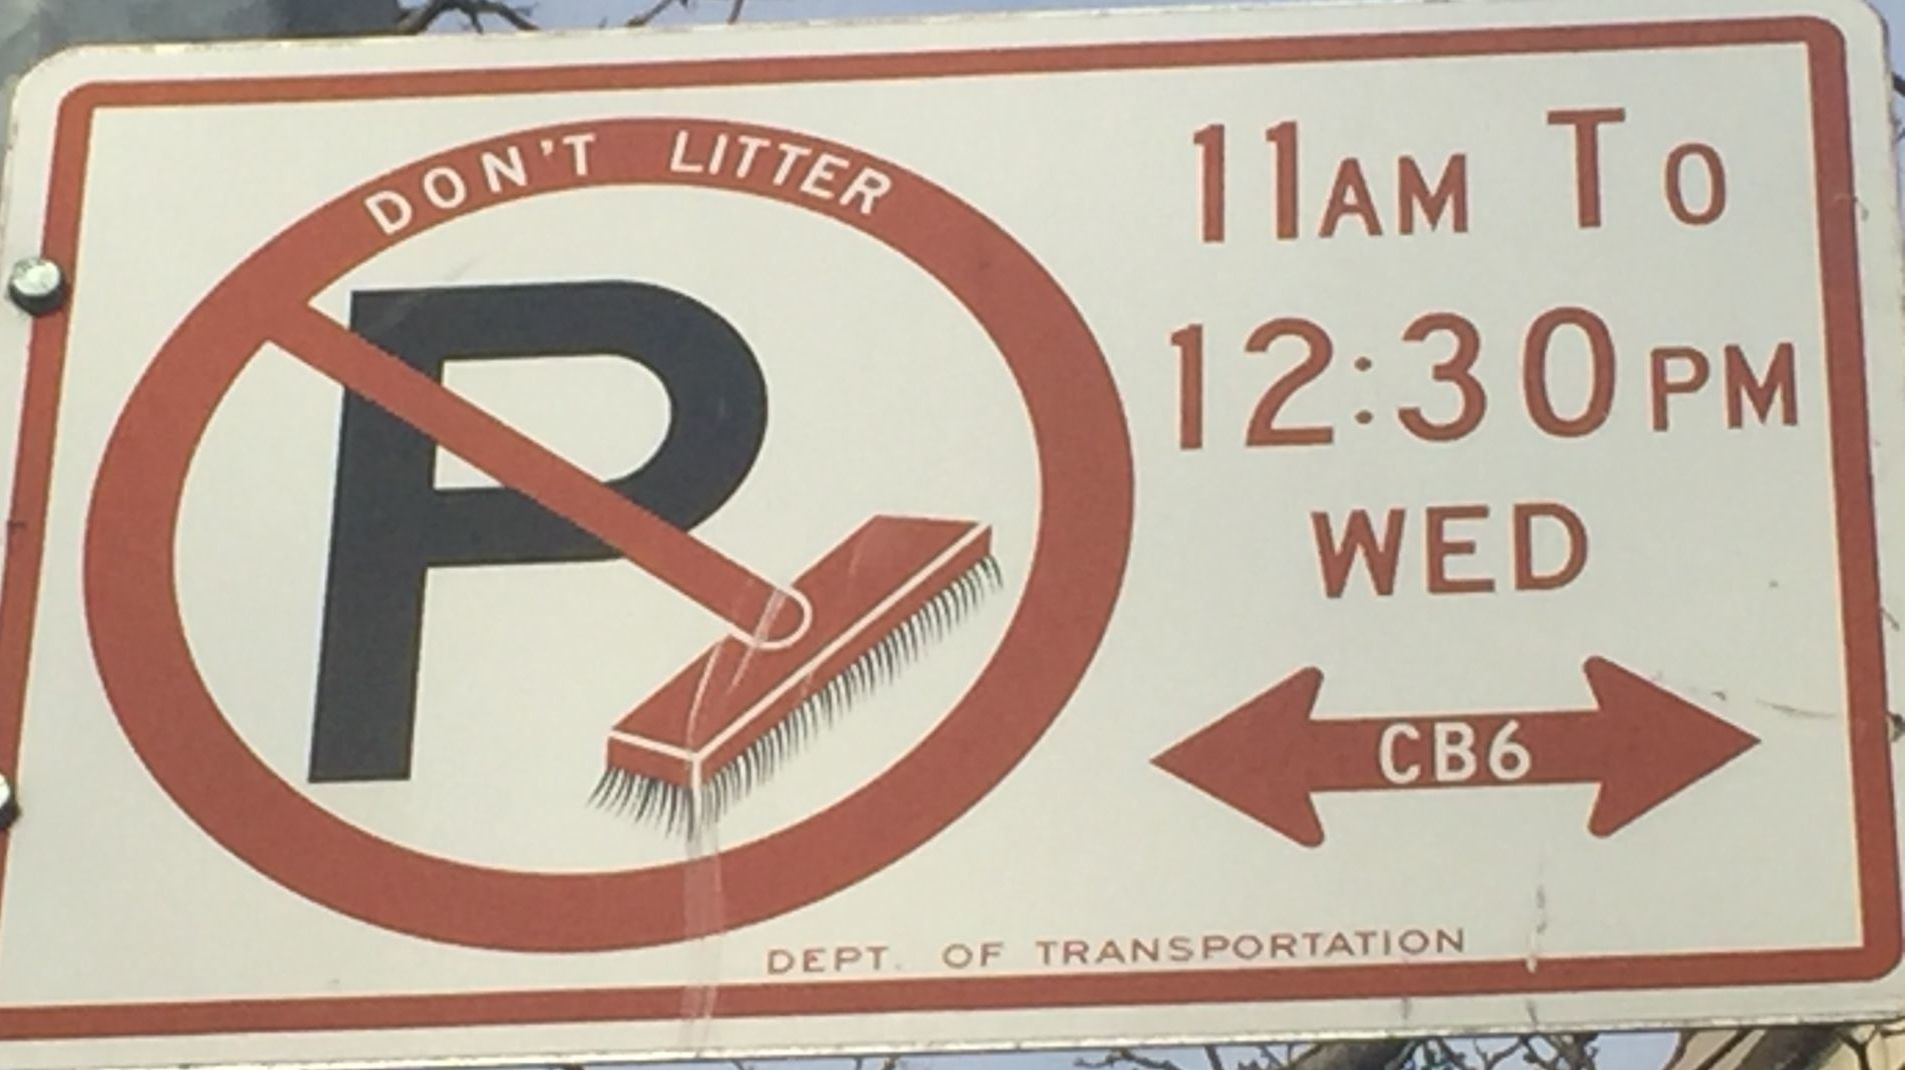 Holidays That Suspend Alternate Side Parking In Nyc Regarding Nyc Alternate Parking Calendar